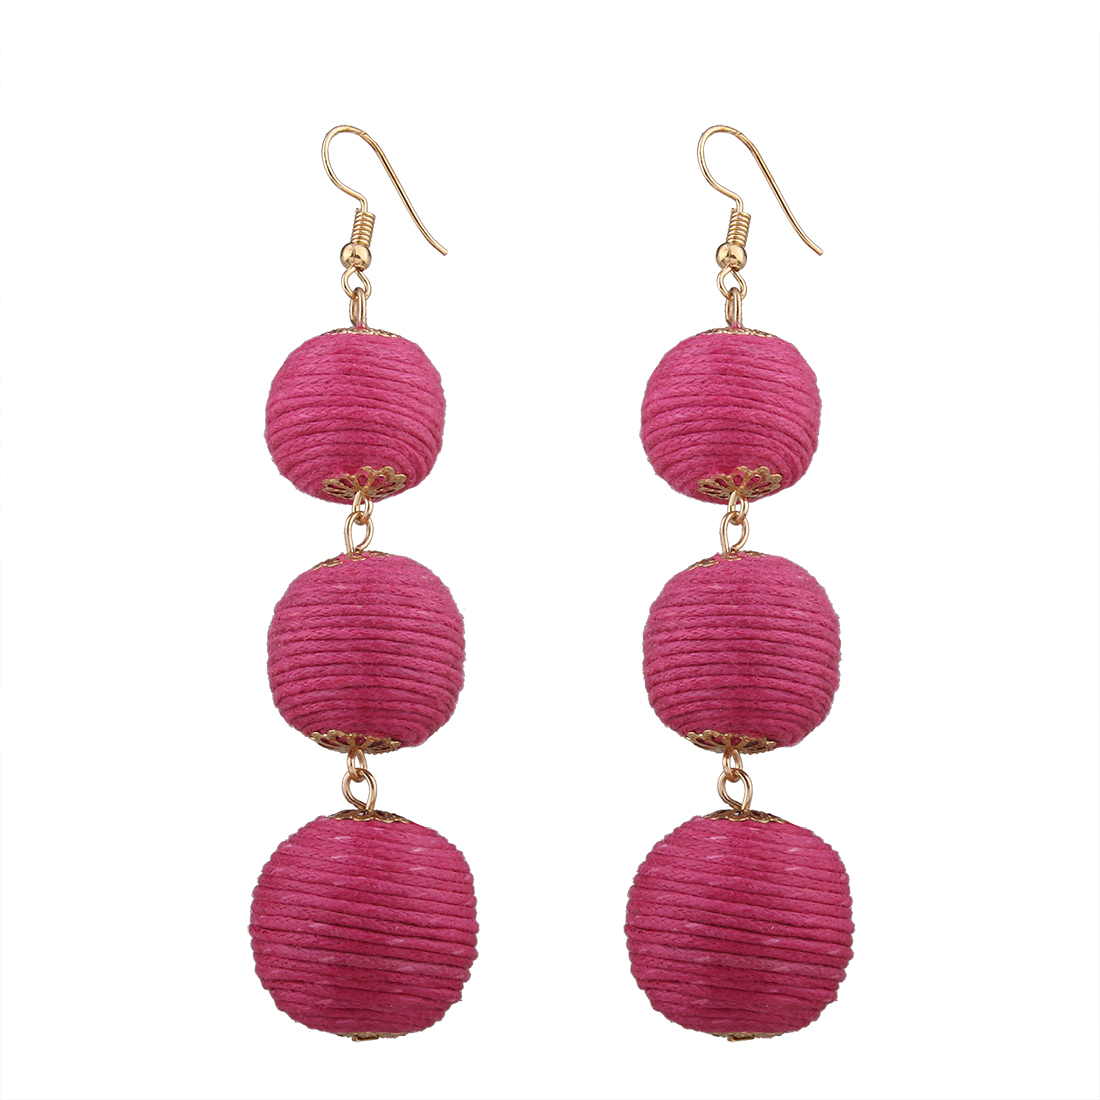 China best design earrings wholesale 🇨🇳 - Alibaba